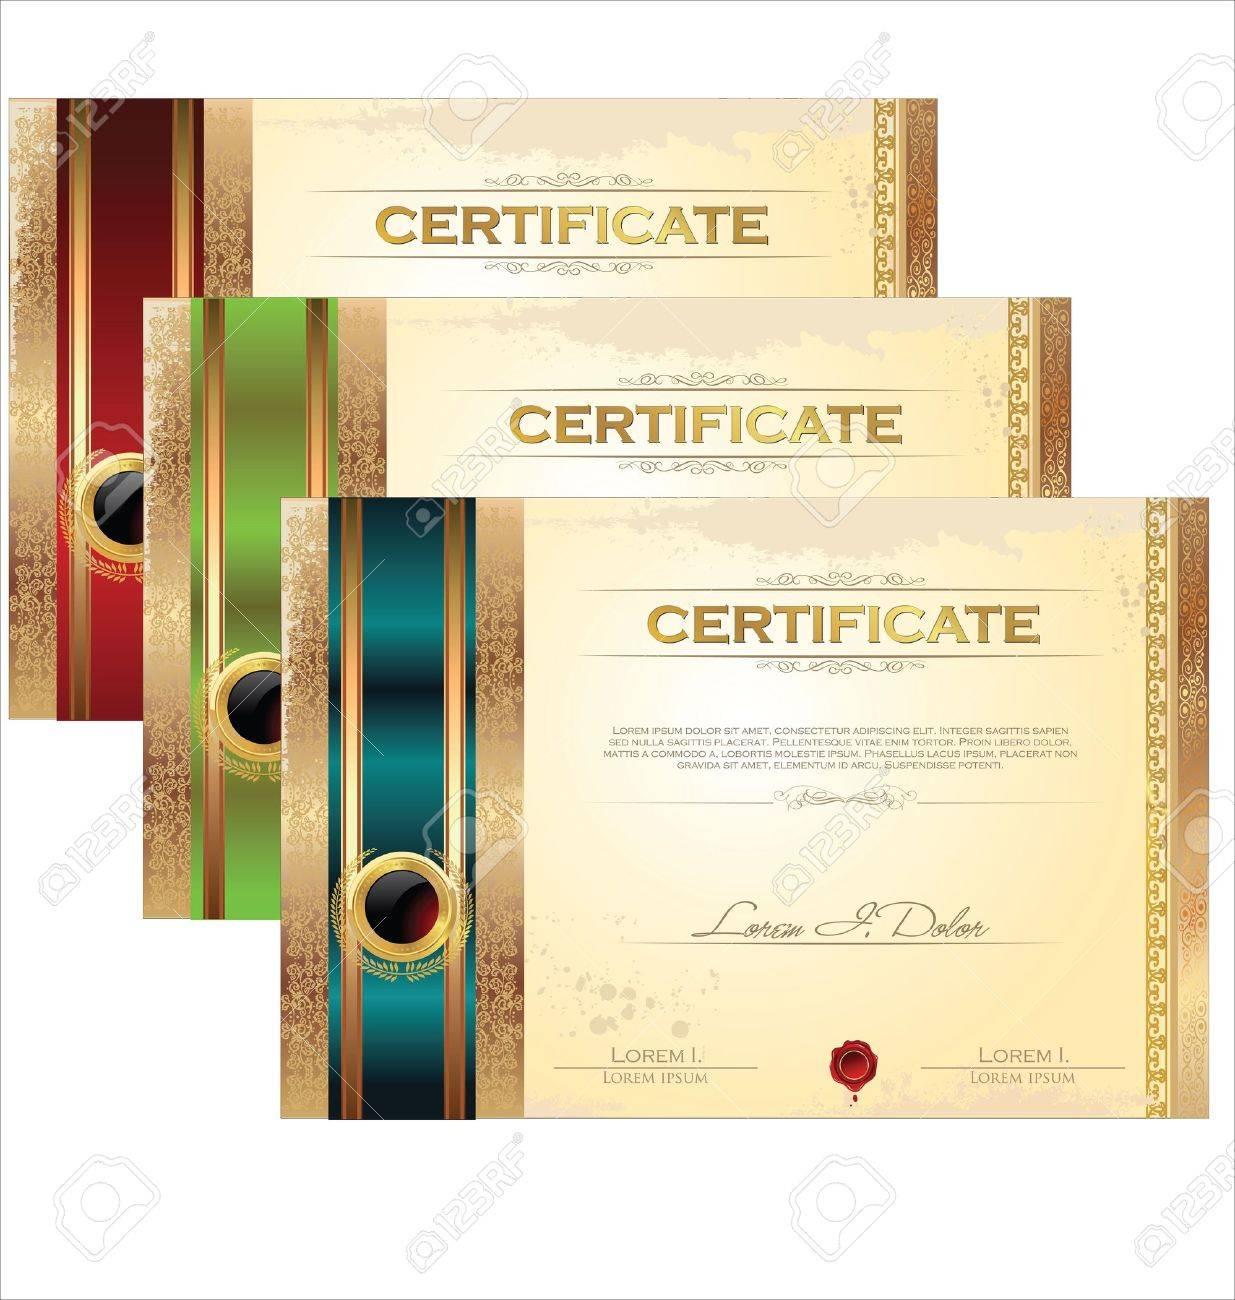 Blank stock certificate template certificate blank productpadco 100 blank share certificate template free stock certificates 20324100 certificate template stock vector blank share certificate xflitez Choice Image